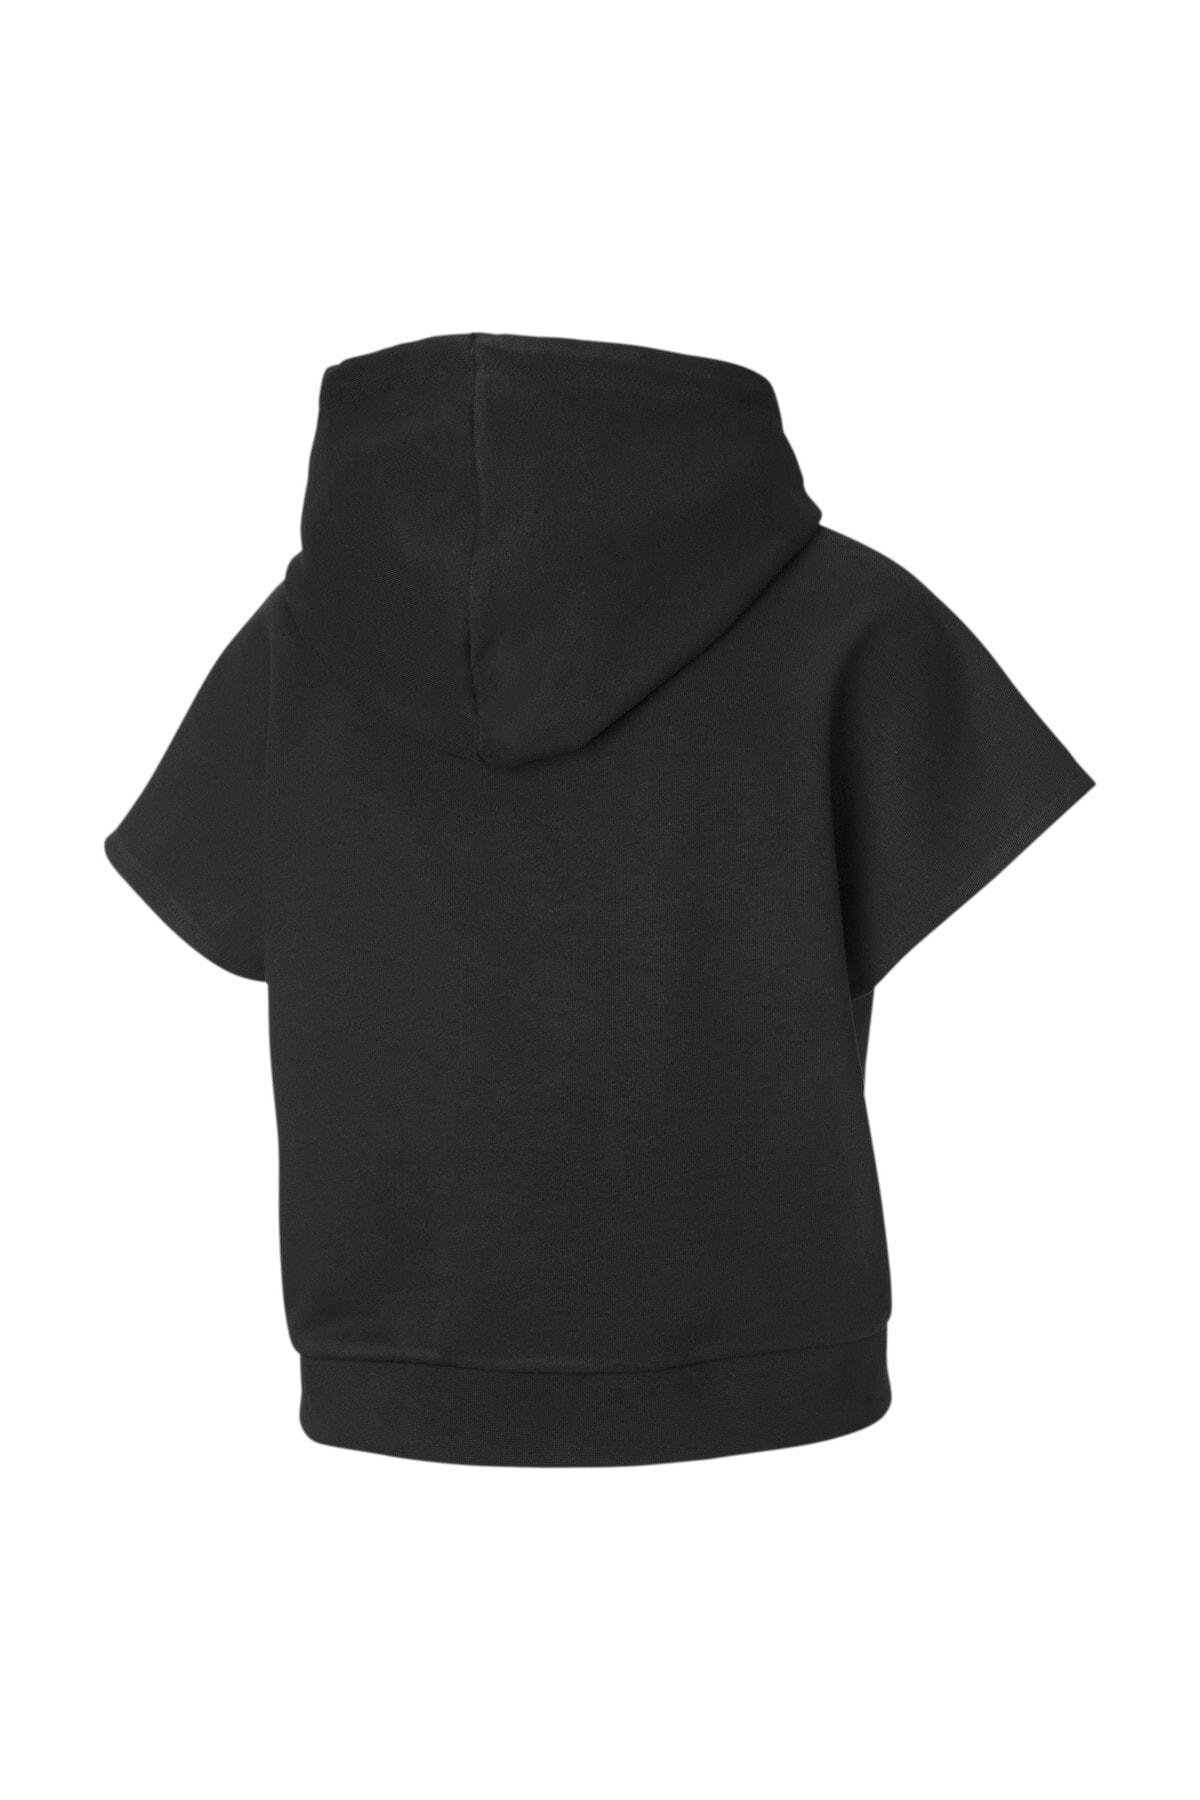 Puma Kadın Siyah Kısa Kollu Spor Sweatshirt 1